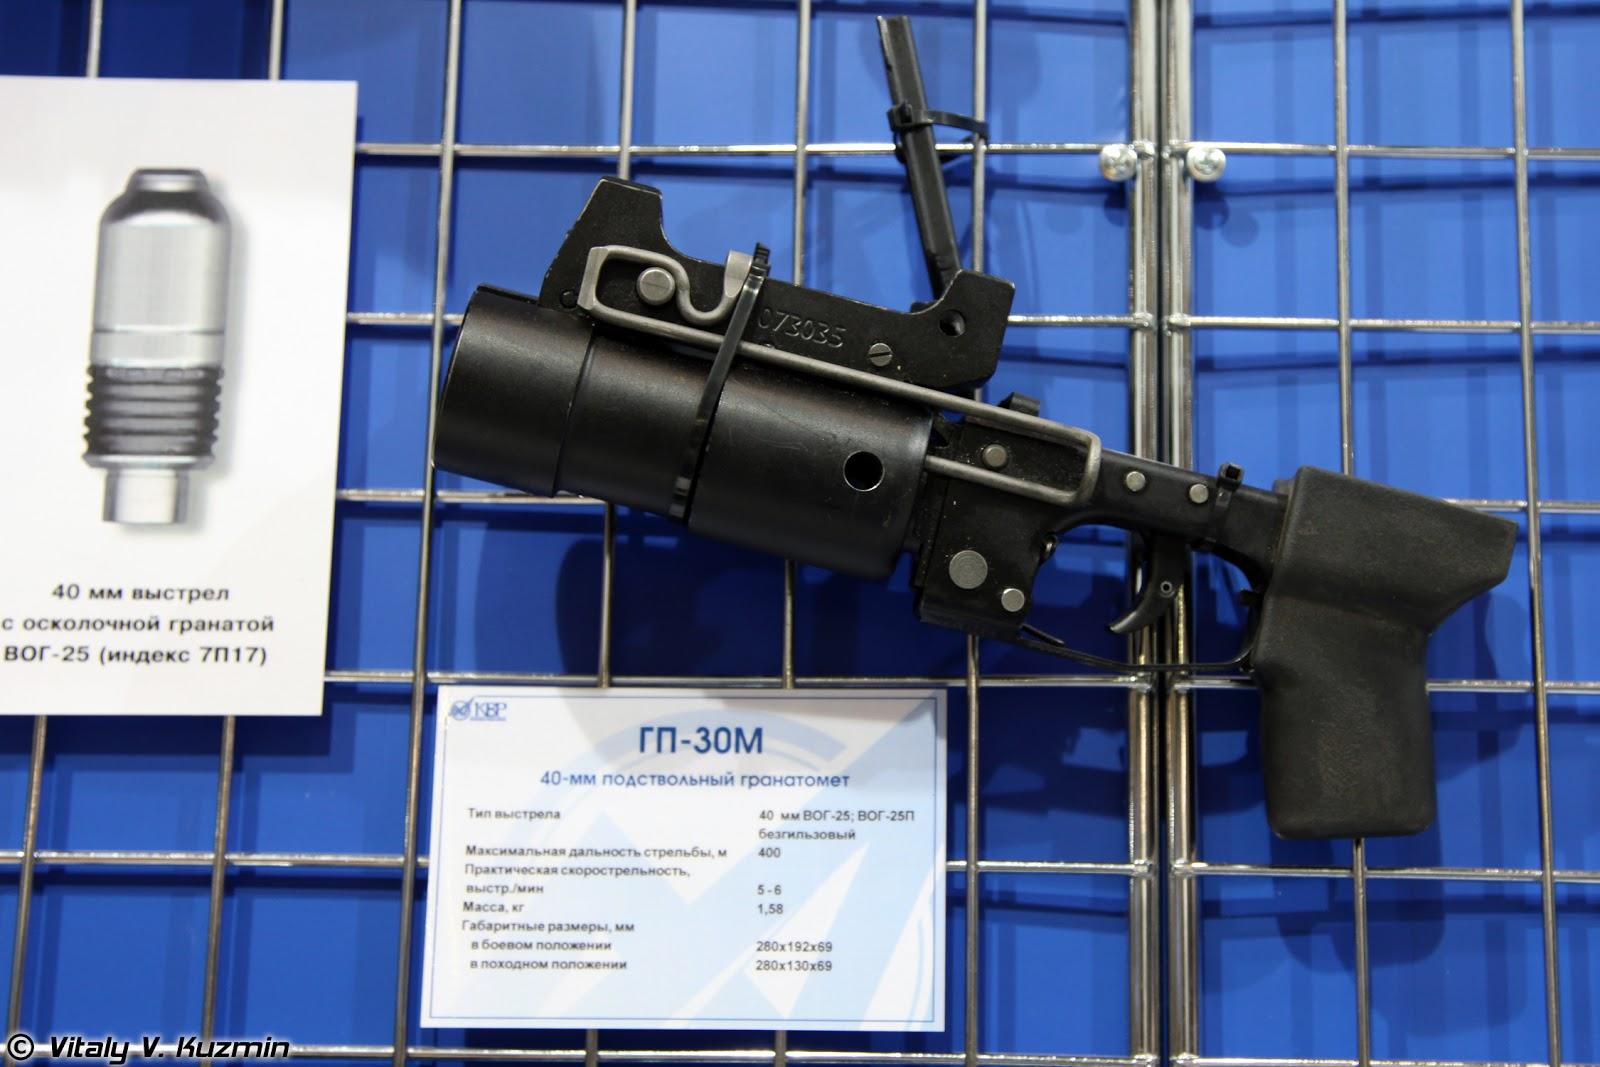 Rusia: Feria de Armas (Interpolitex 2012) [Megapost]